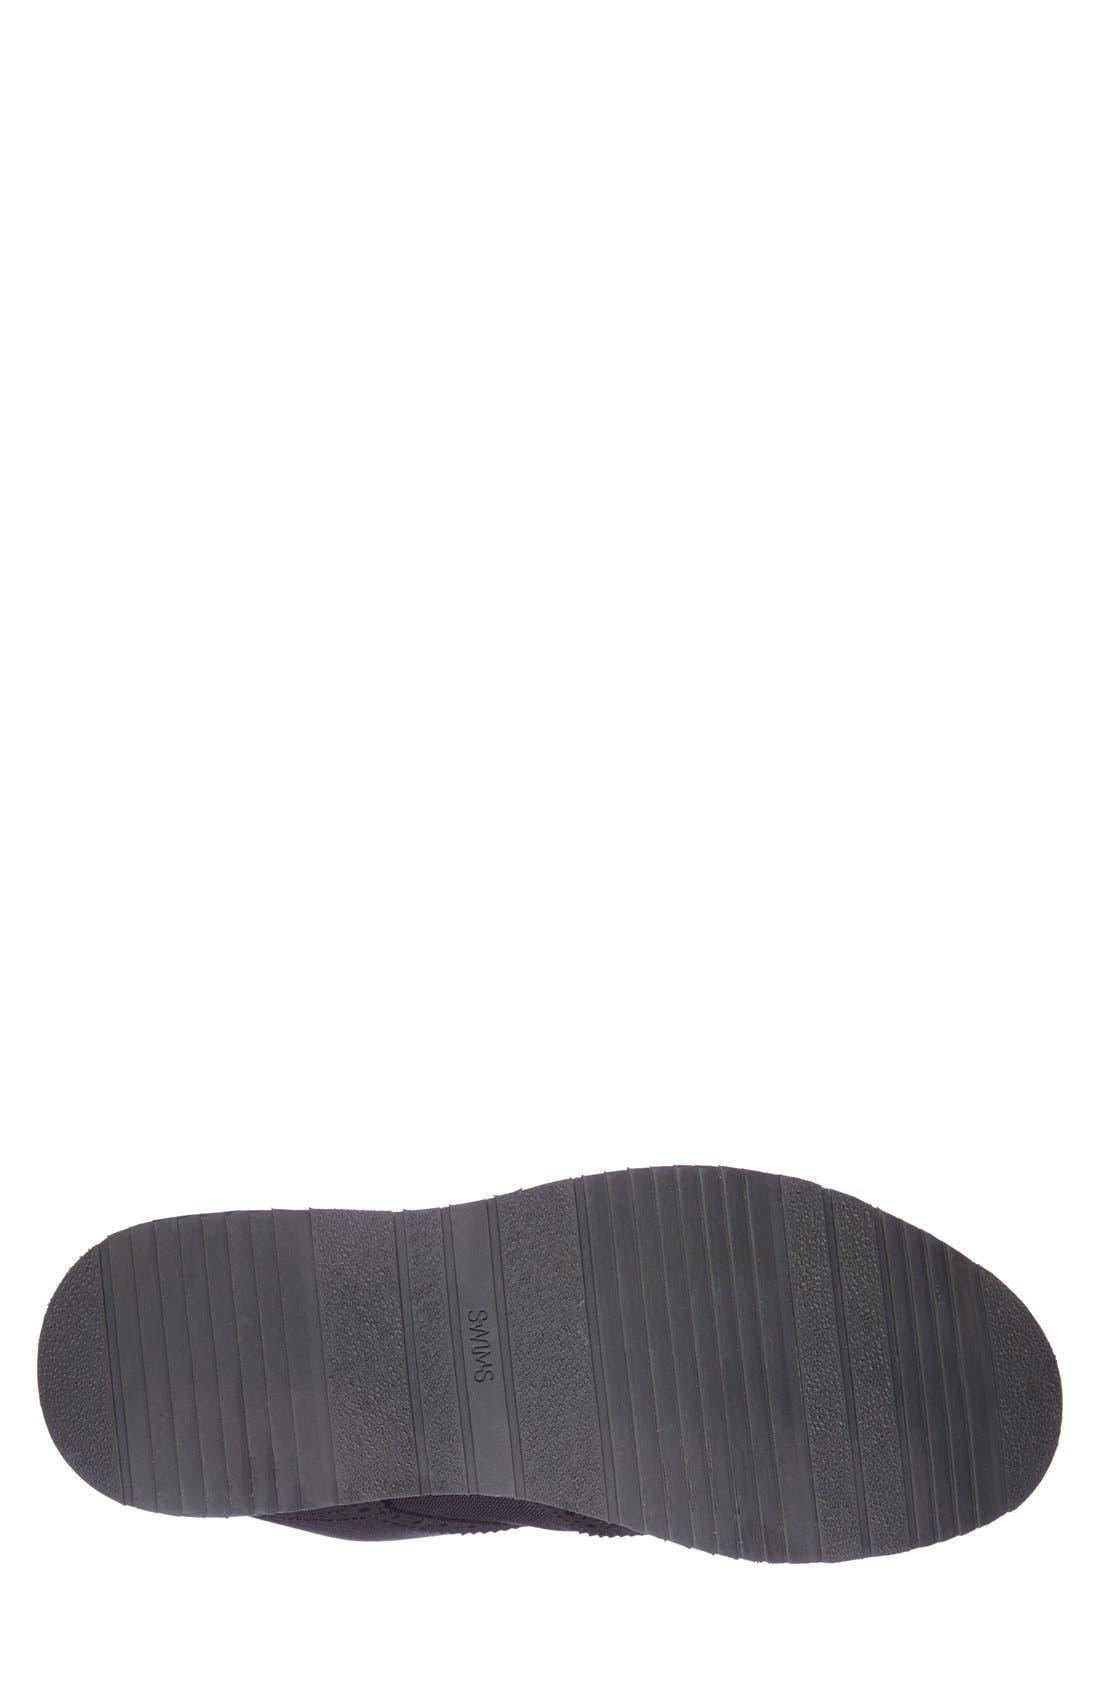 'Barry' Wingtip Boot,                             Alternate thumbnail 4, color,                             Black